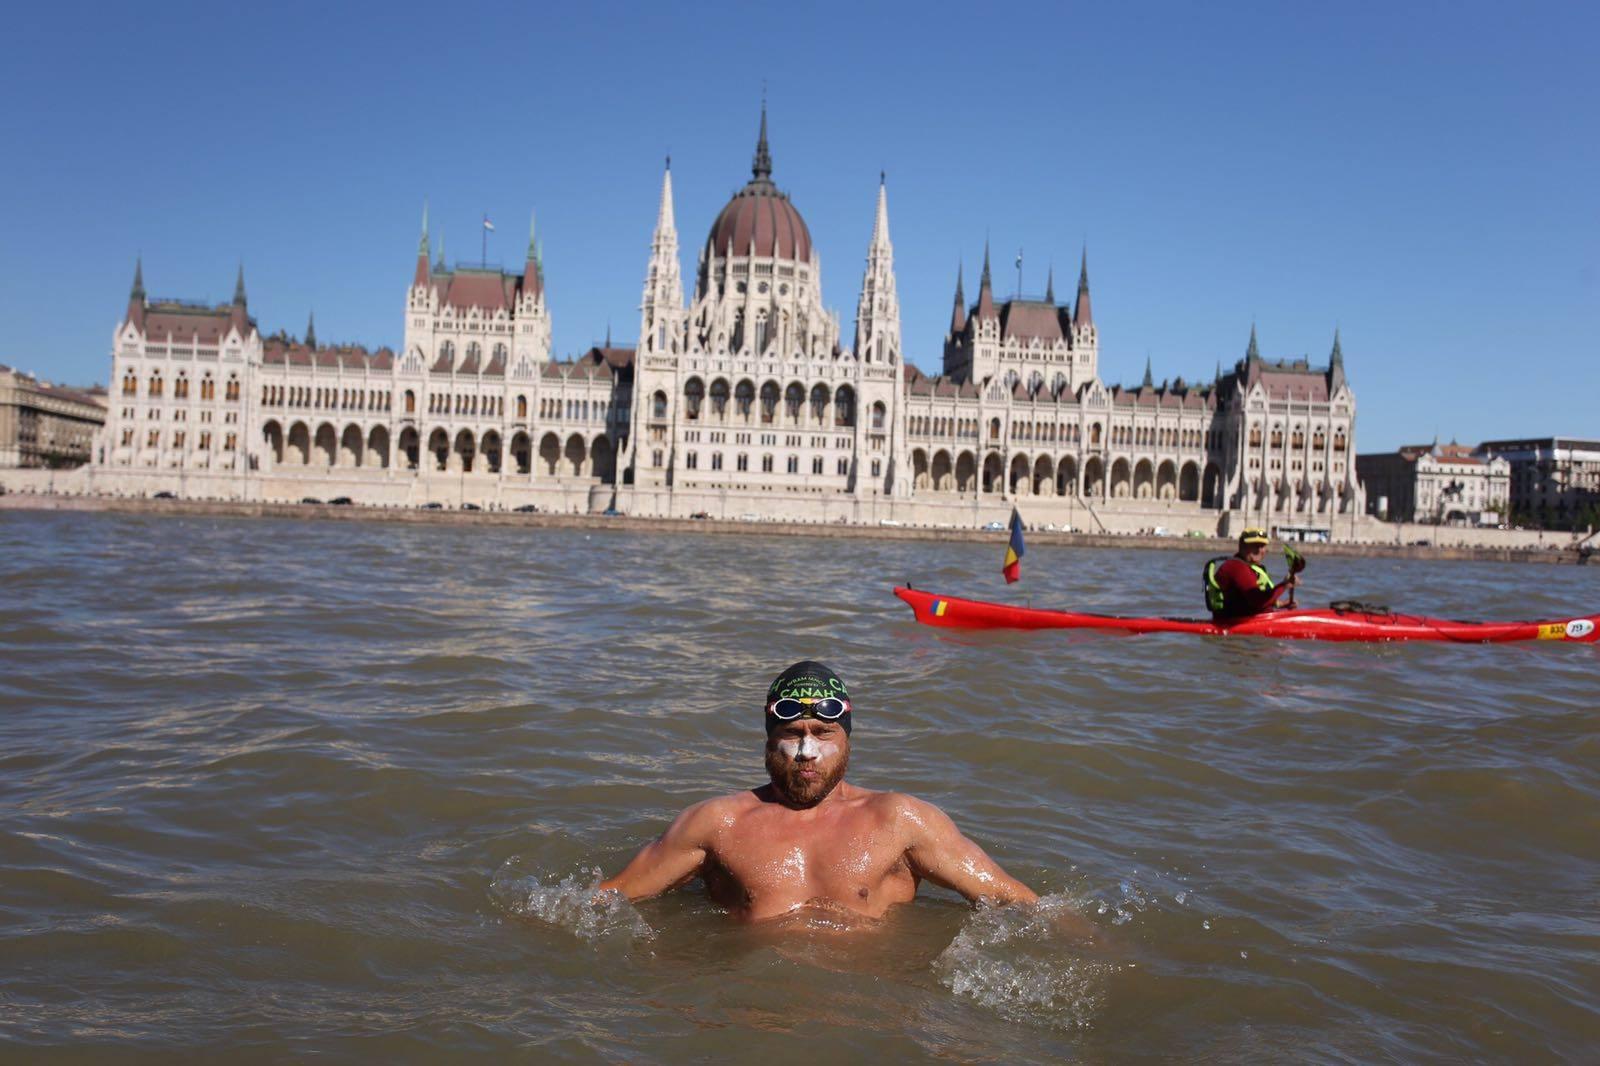 Dunare: Avram Iancu a traversat capitala Ungariei, Budapesta.